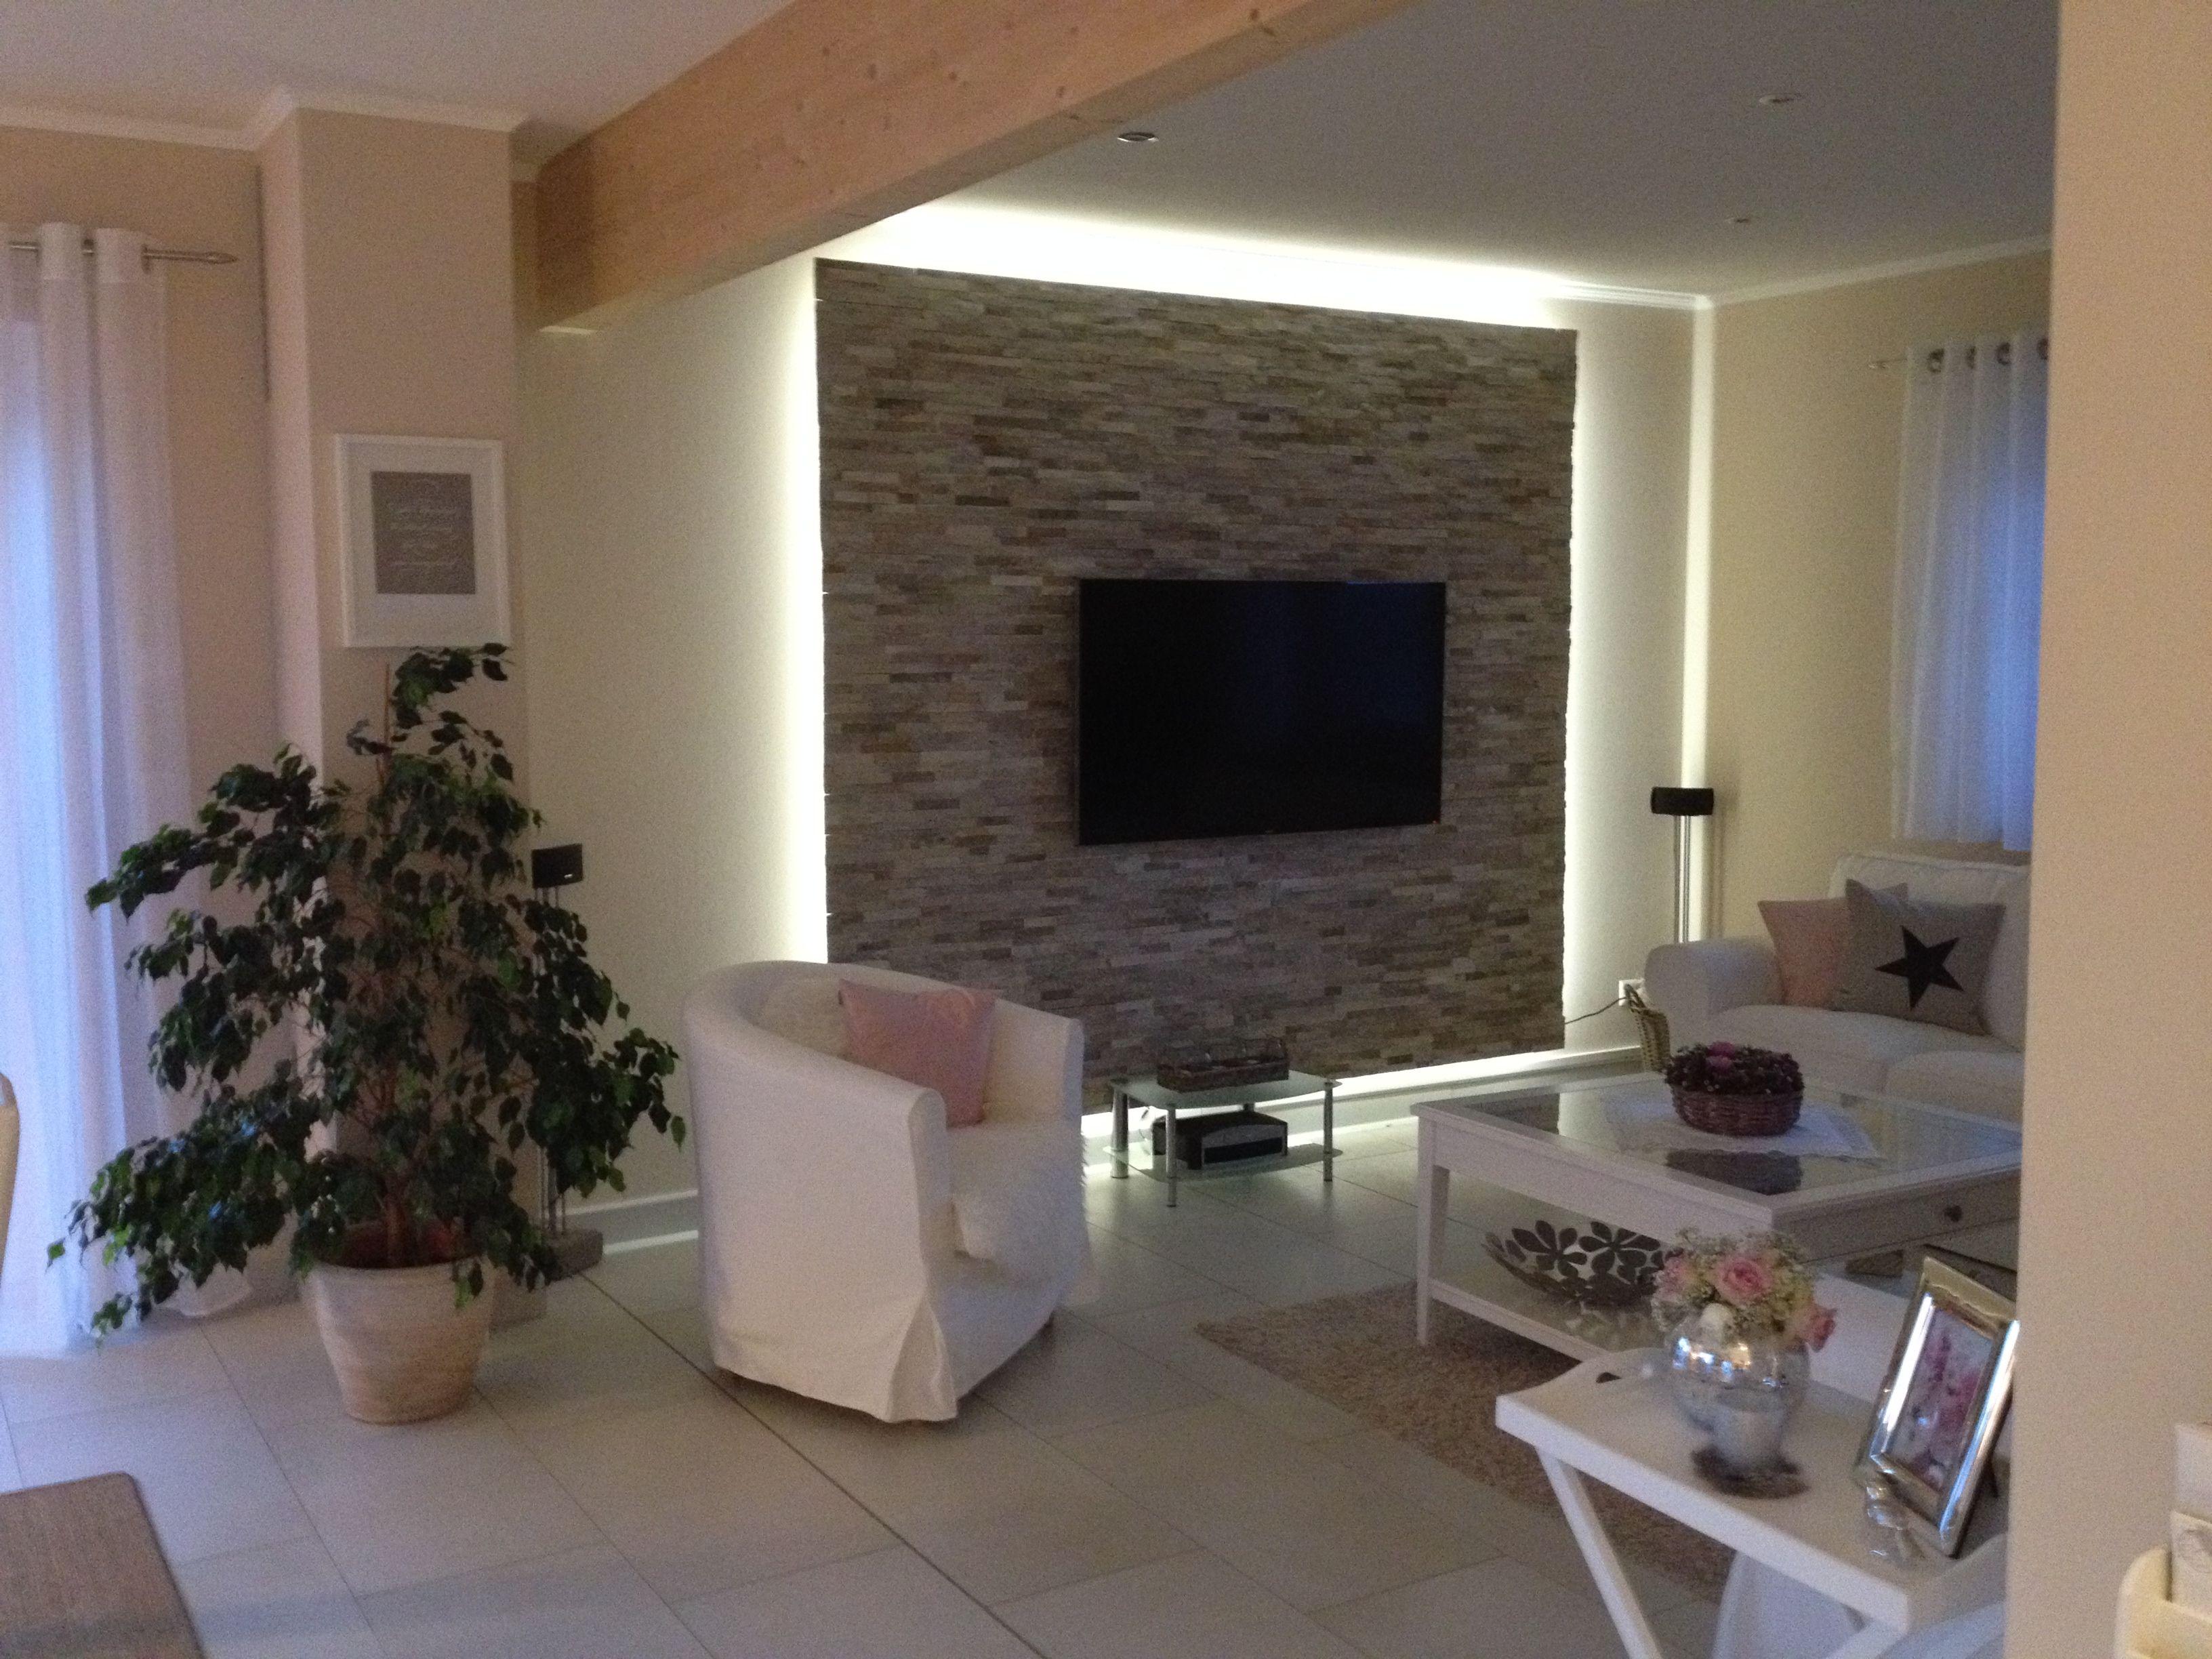 unsere fertige tv wand mit beleuchtung selfmade diy inspirationen aller art pinterest. Black Bedroom Furniture Sets. Home Design Ideas